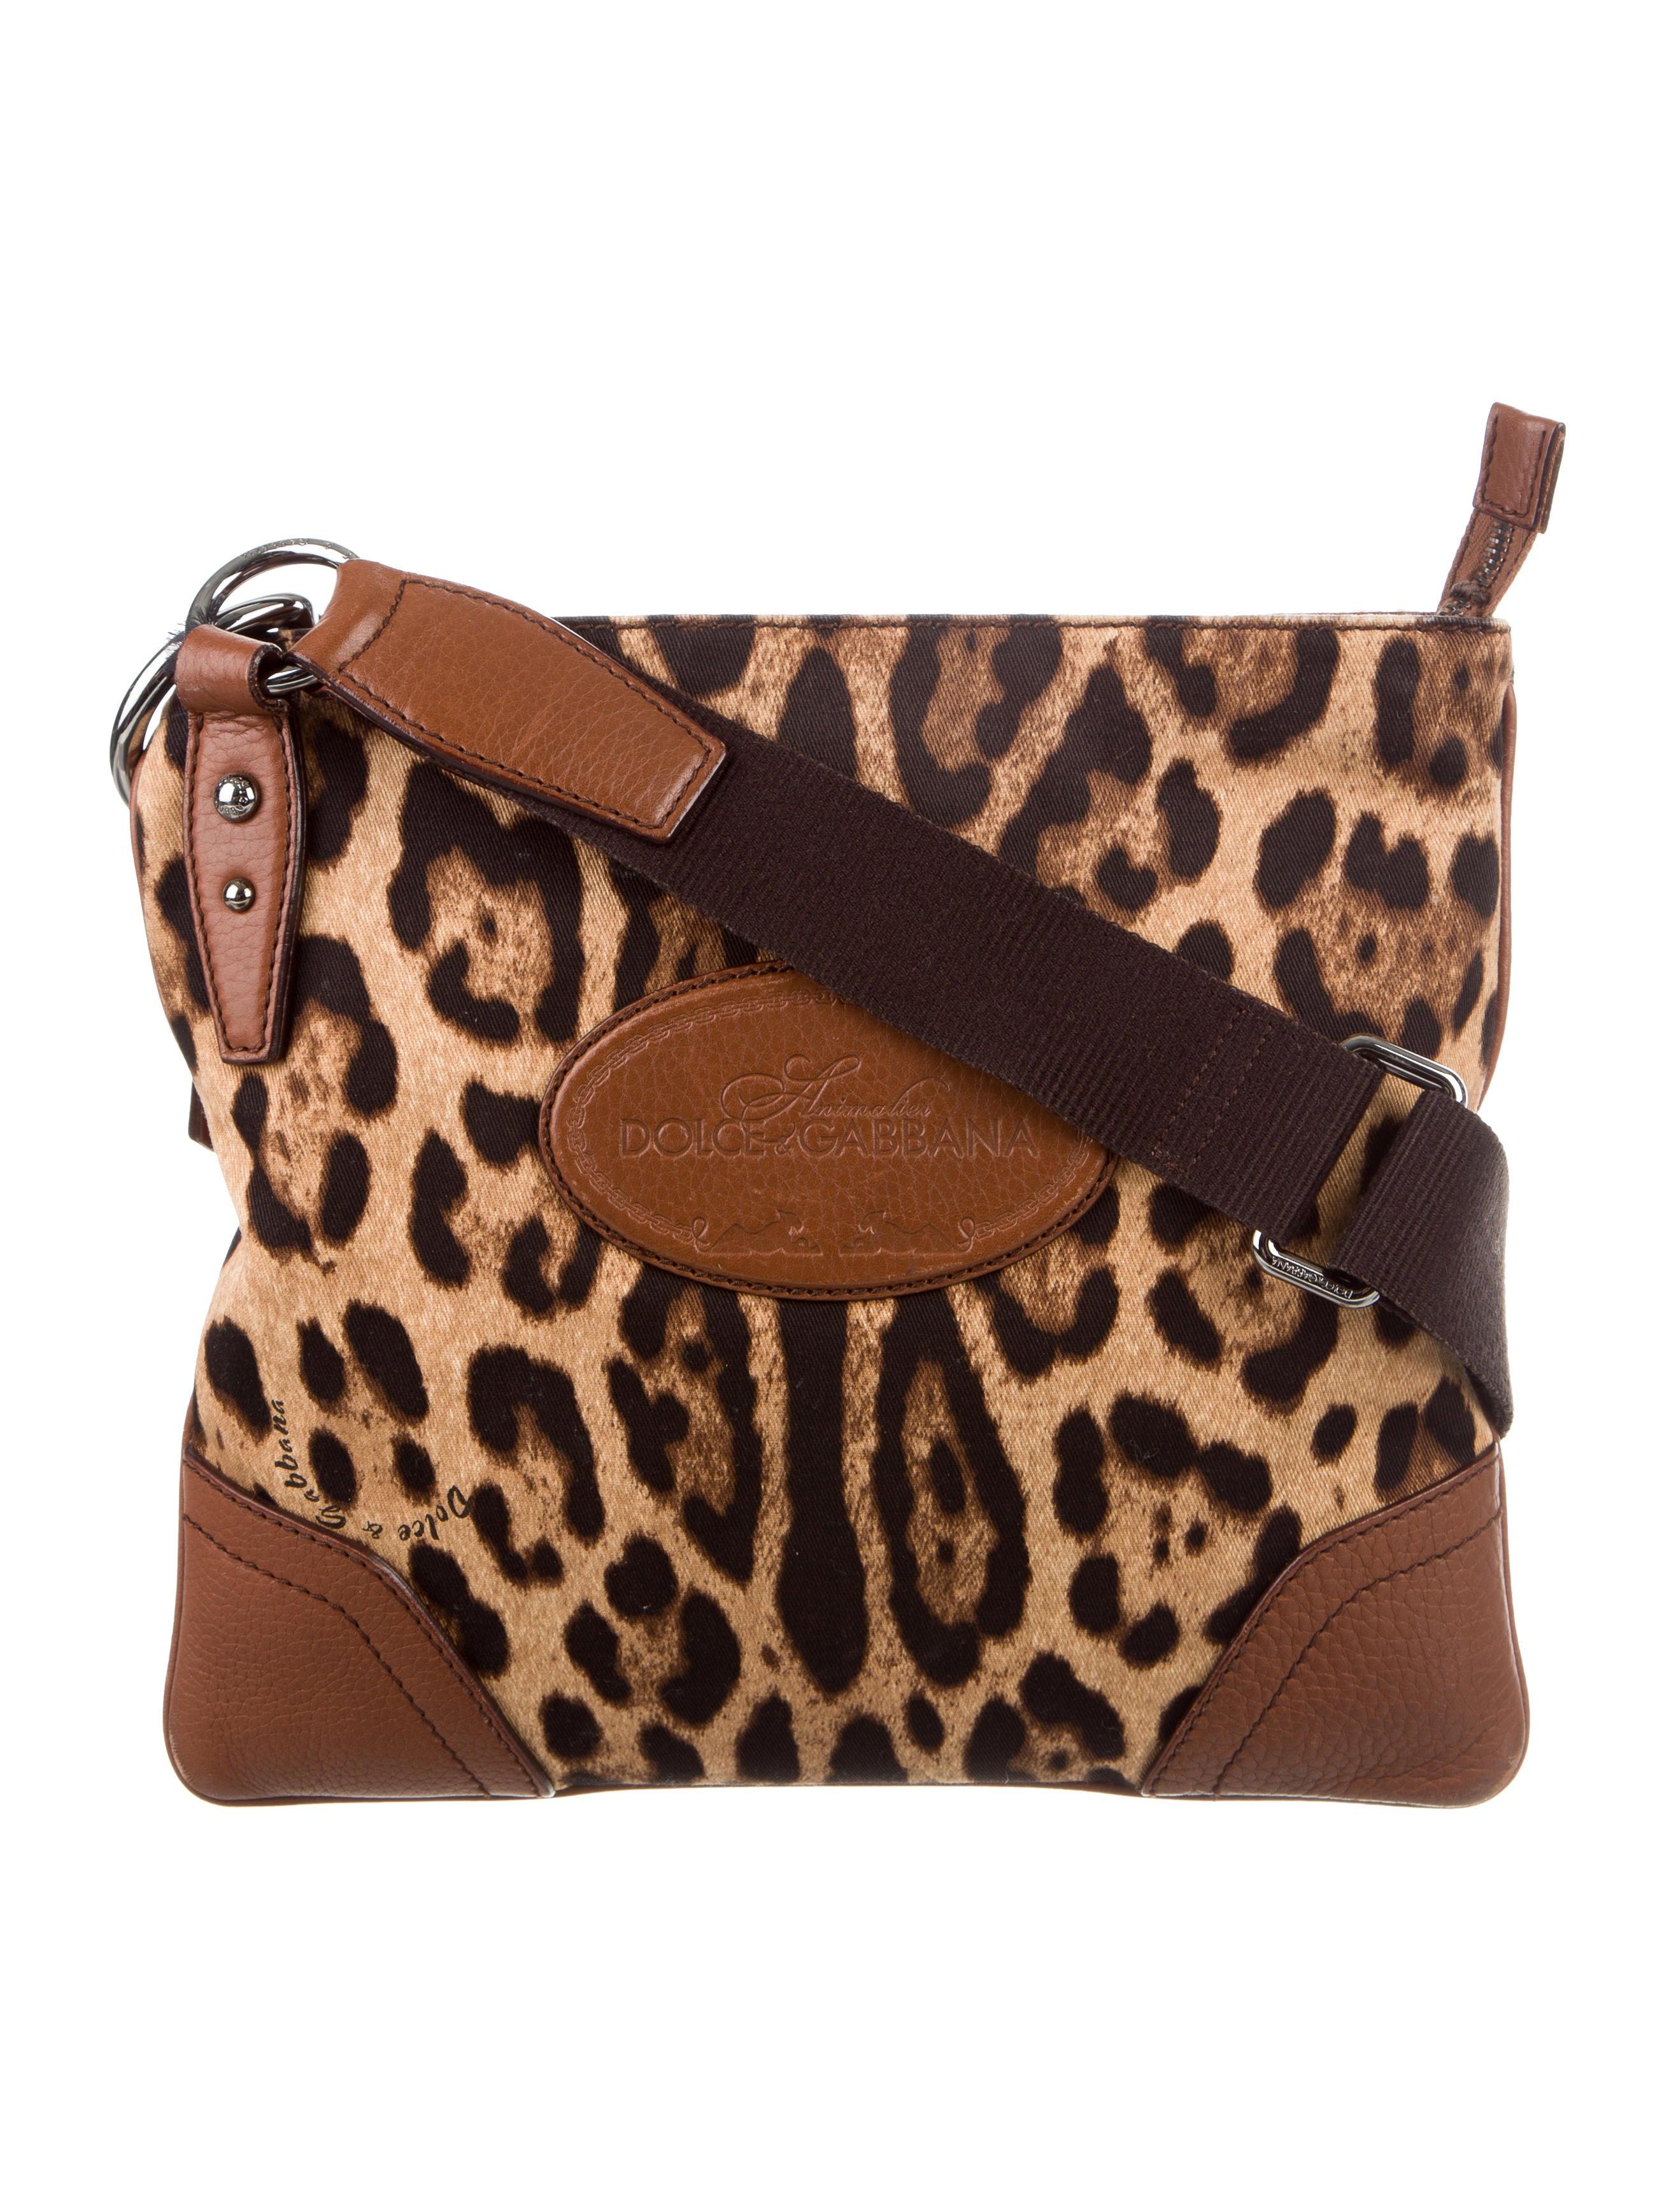 Dolce Amp Gabbana Animal Print Messenger Bag Handbags